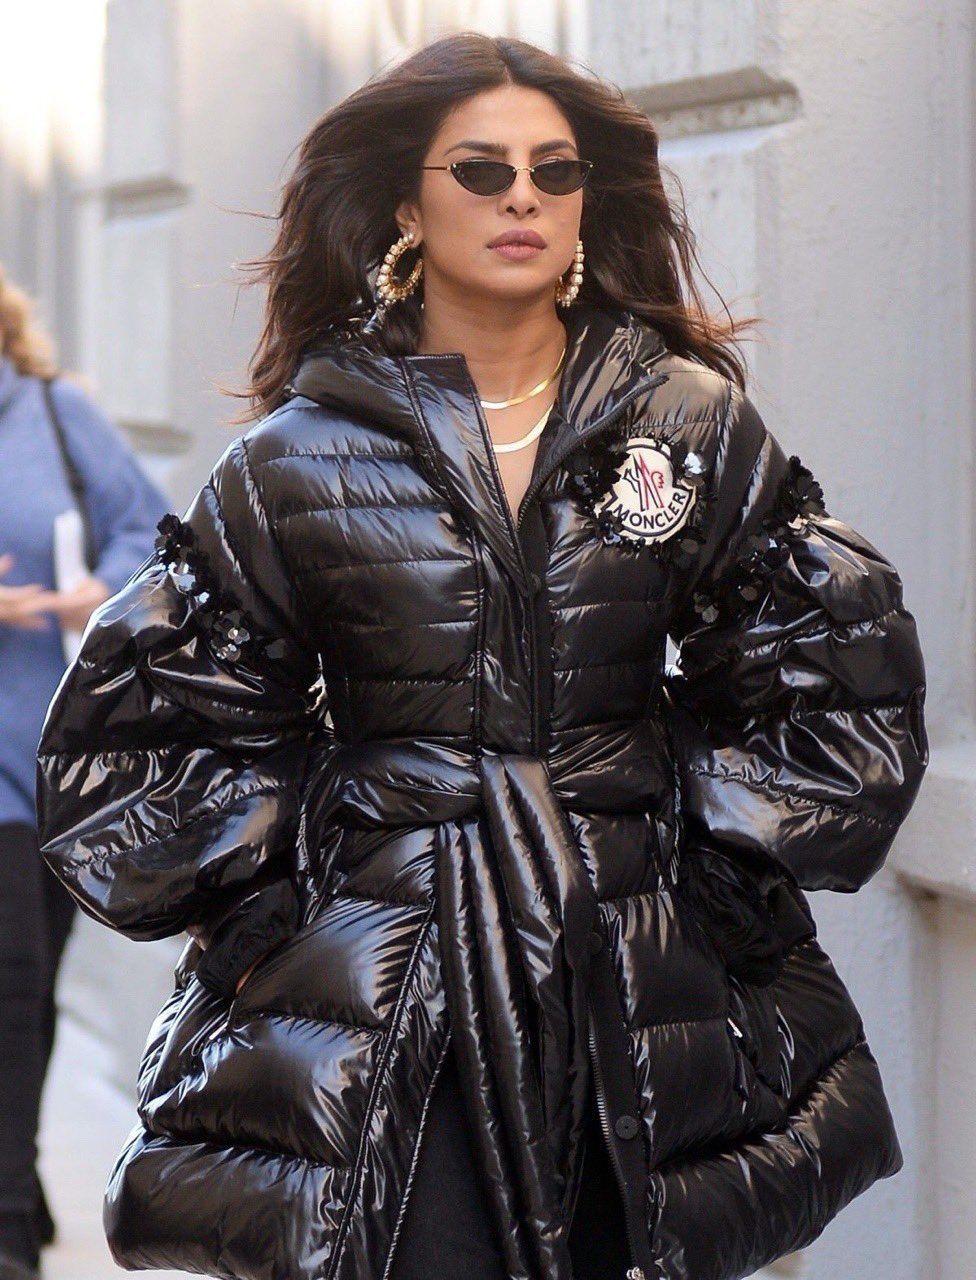 chrissykia in 2019 Fashion, Winter fashion, Moncler